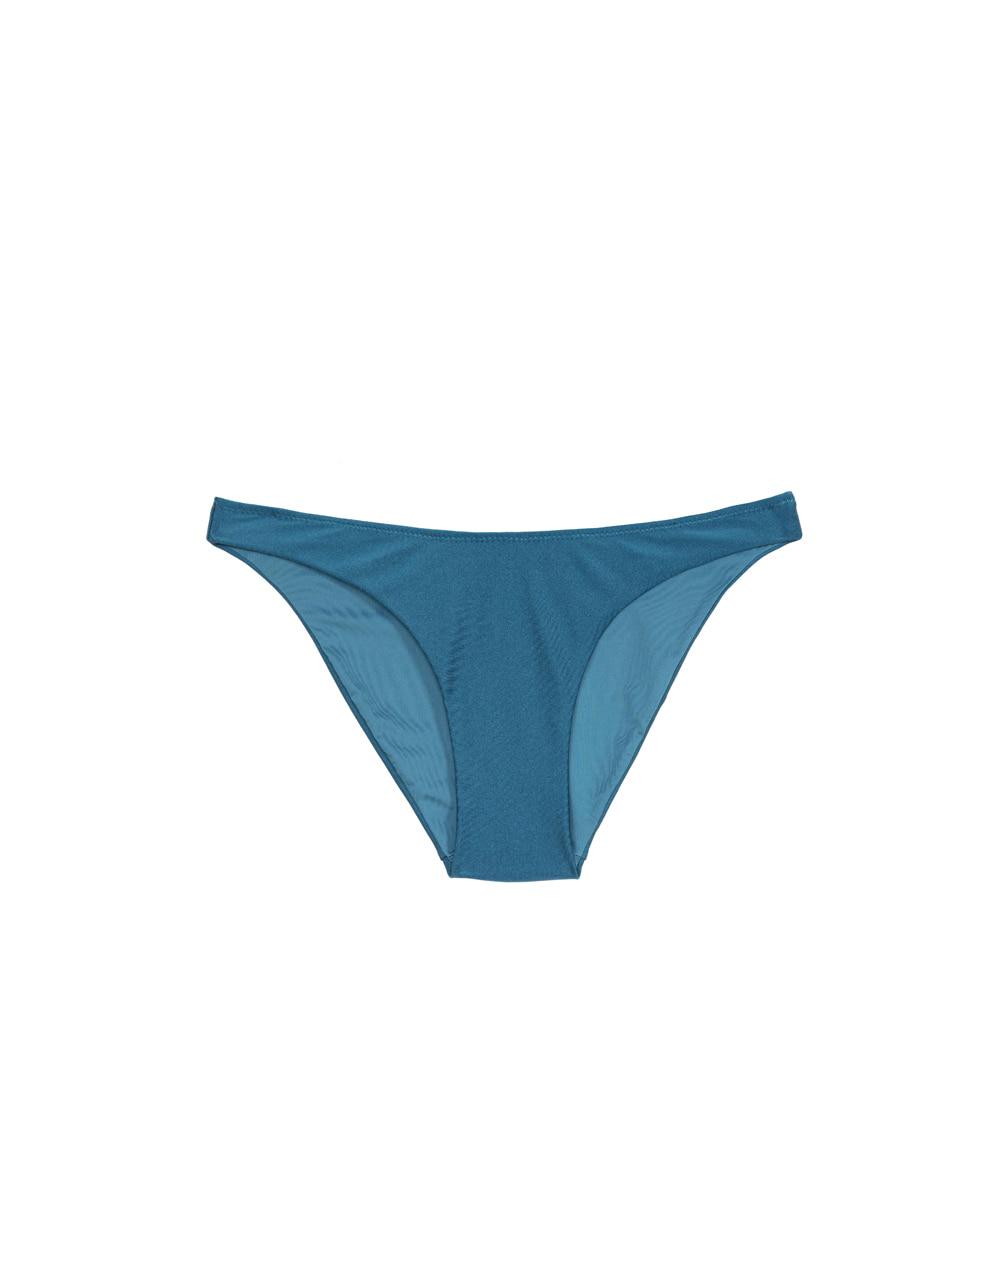 swimsuit bikini bottom Amalfi Blue 20 € Girls In Paris photo 6